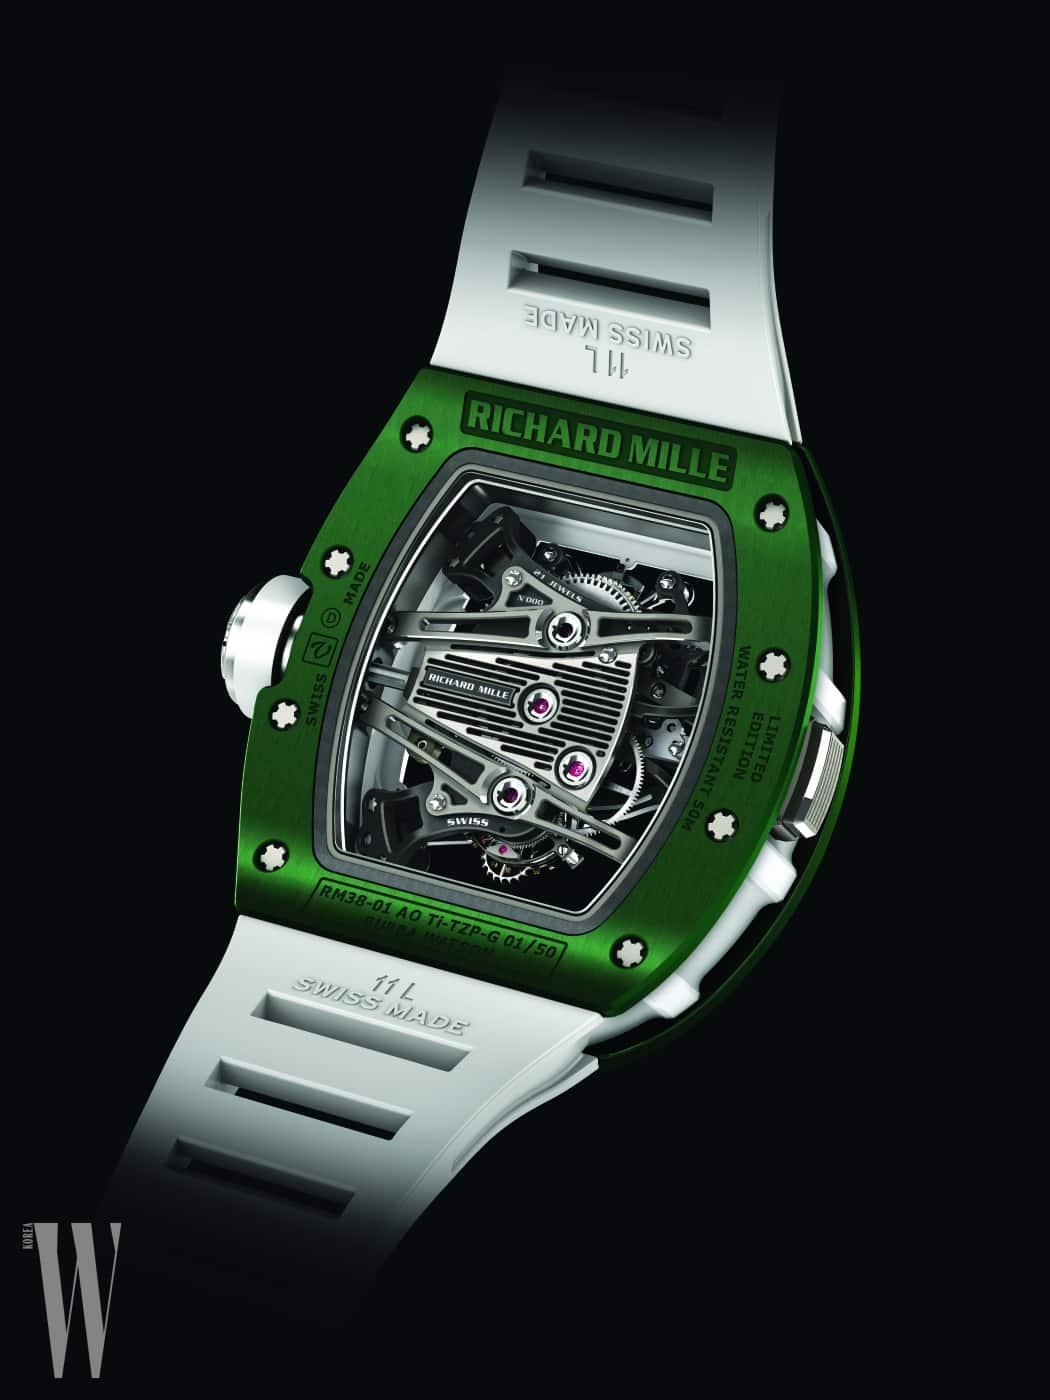 RM38-01 G-센서 투르비용 버바 왓슨 컬렉션은 골프 애호가들에게 사랑 받을 모델이다. 전세계 50개 리미티드 에디션으로 선보여 소장가치가 높다. 특히 유명 골프선수인 버바 왓슨에서 영감을 받아 디자인된 모델답게 잔디를 연상시키는 녹색 케이스가 인상적이며, 스윙 시 제약이 없도록 고안된 세계 최초 메케니컬 G센서가 장착되어 있다.